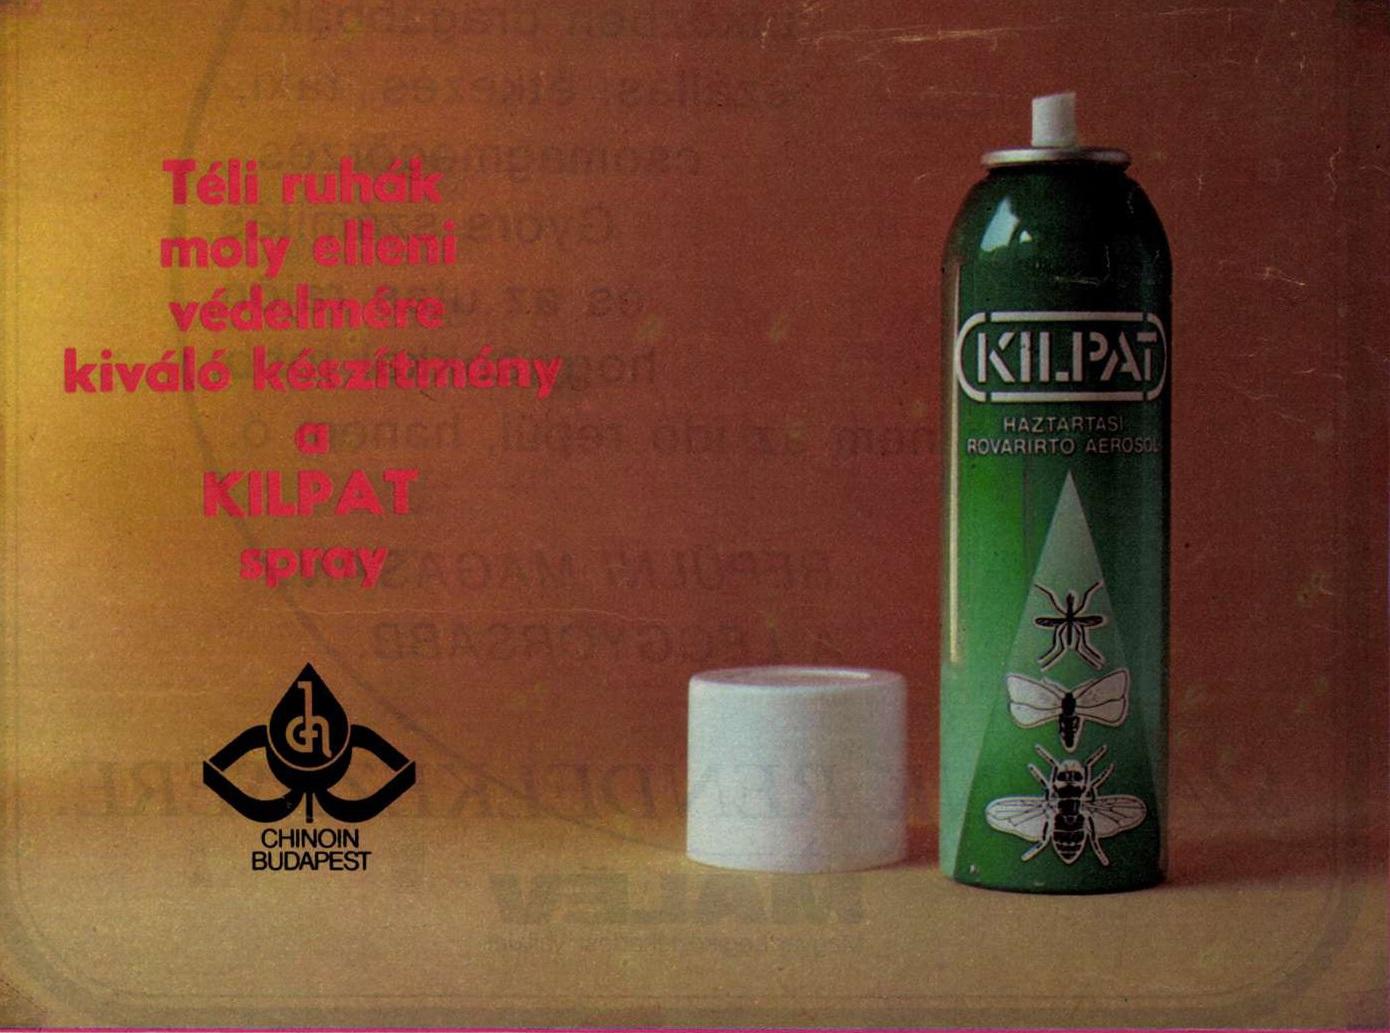 idokapszula_nb_i_1983_84_29_fordulo_reklam_3.jpg